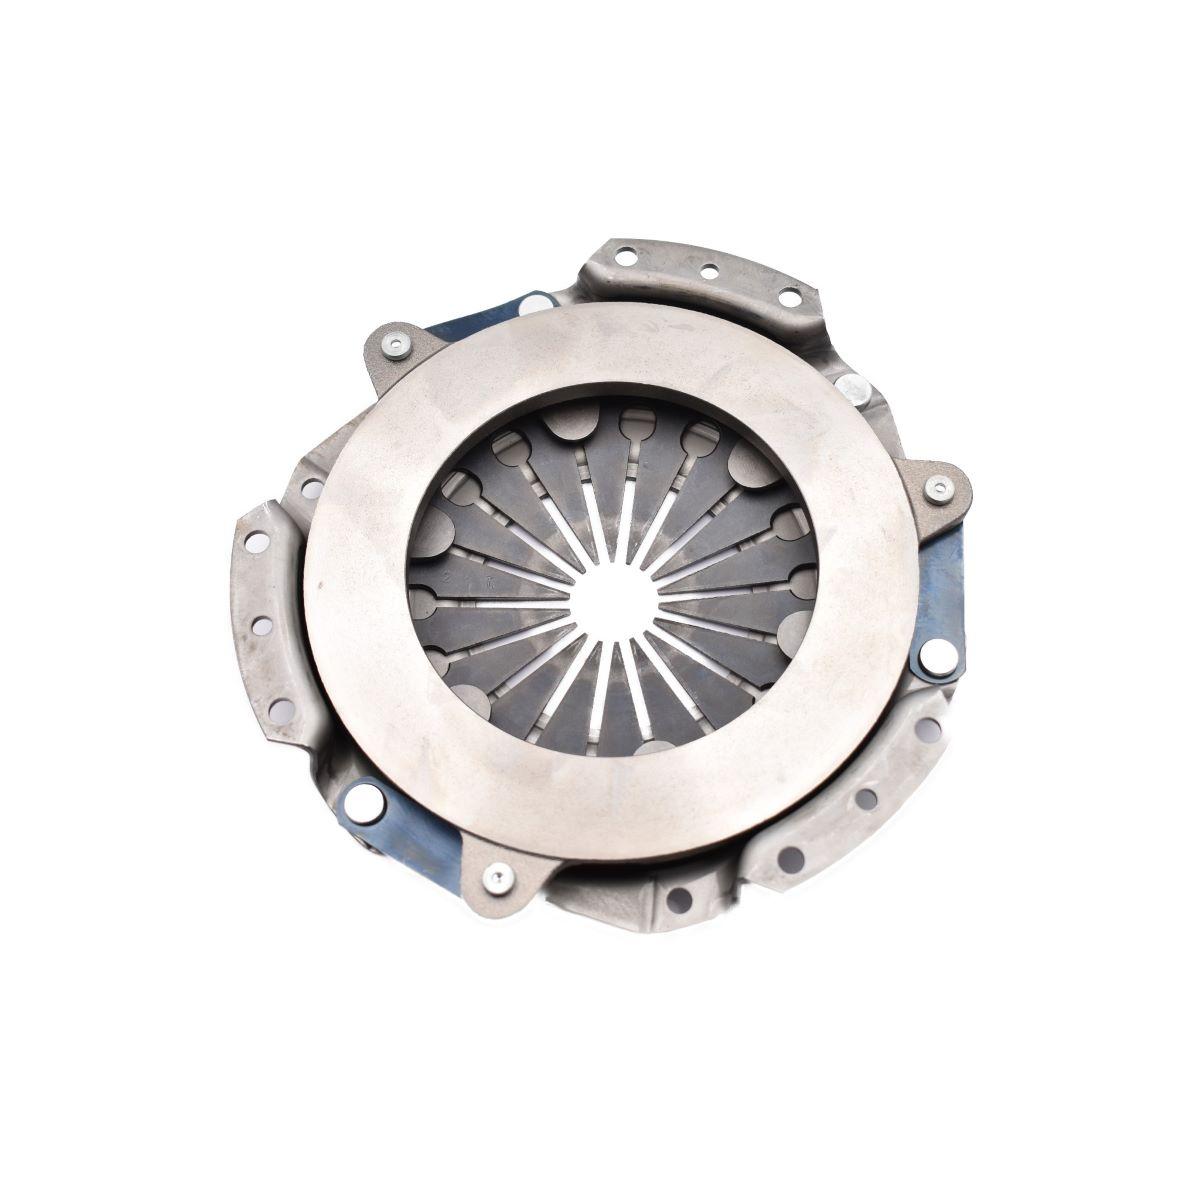 KUBOTA T1 LF-164, XL 021YT1. - Diameter 220 mm. - 183 / 123 mm. - Mounting bolt spacing: 55 mm. : (M01:B81)